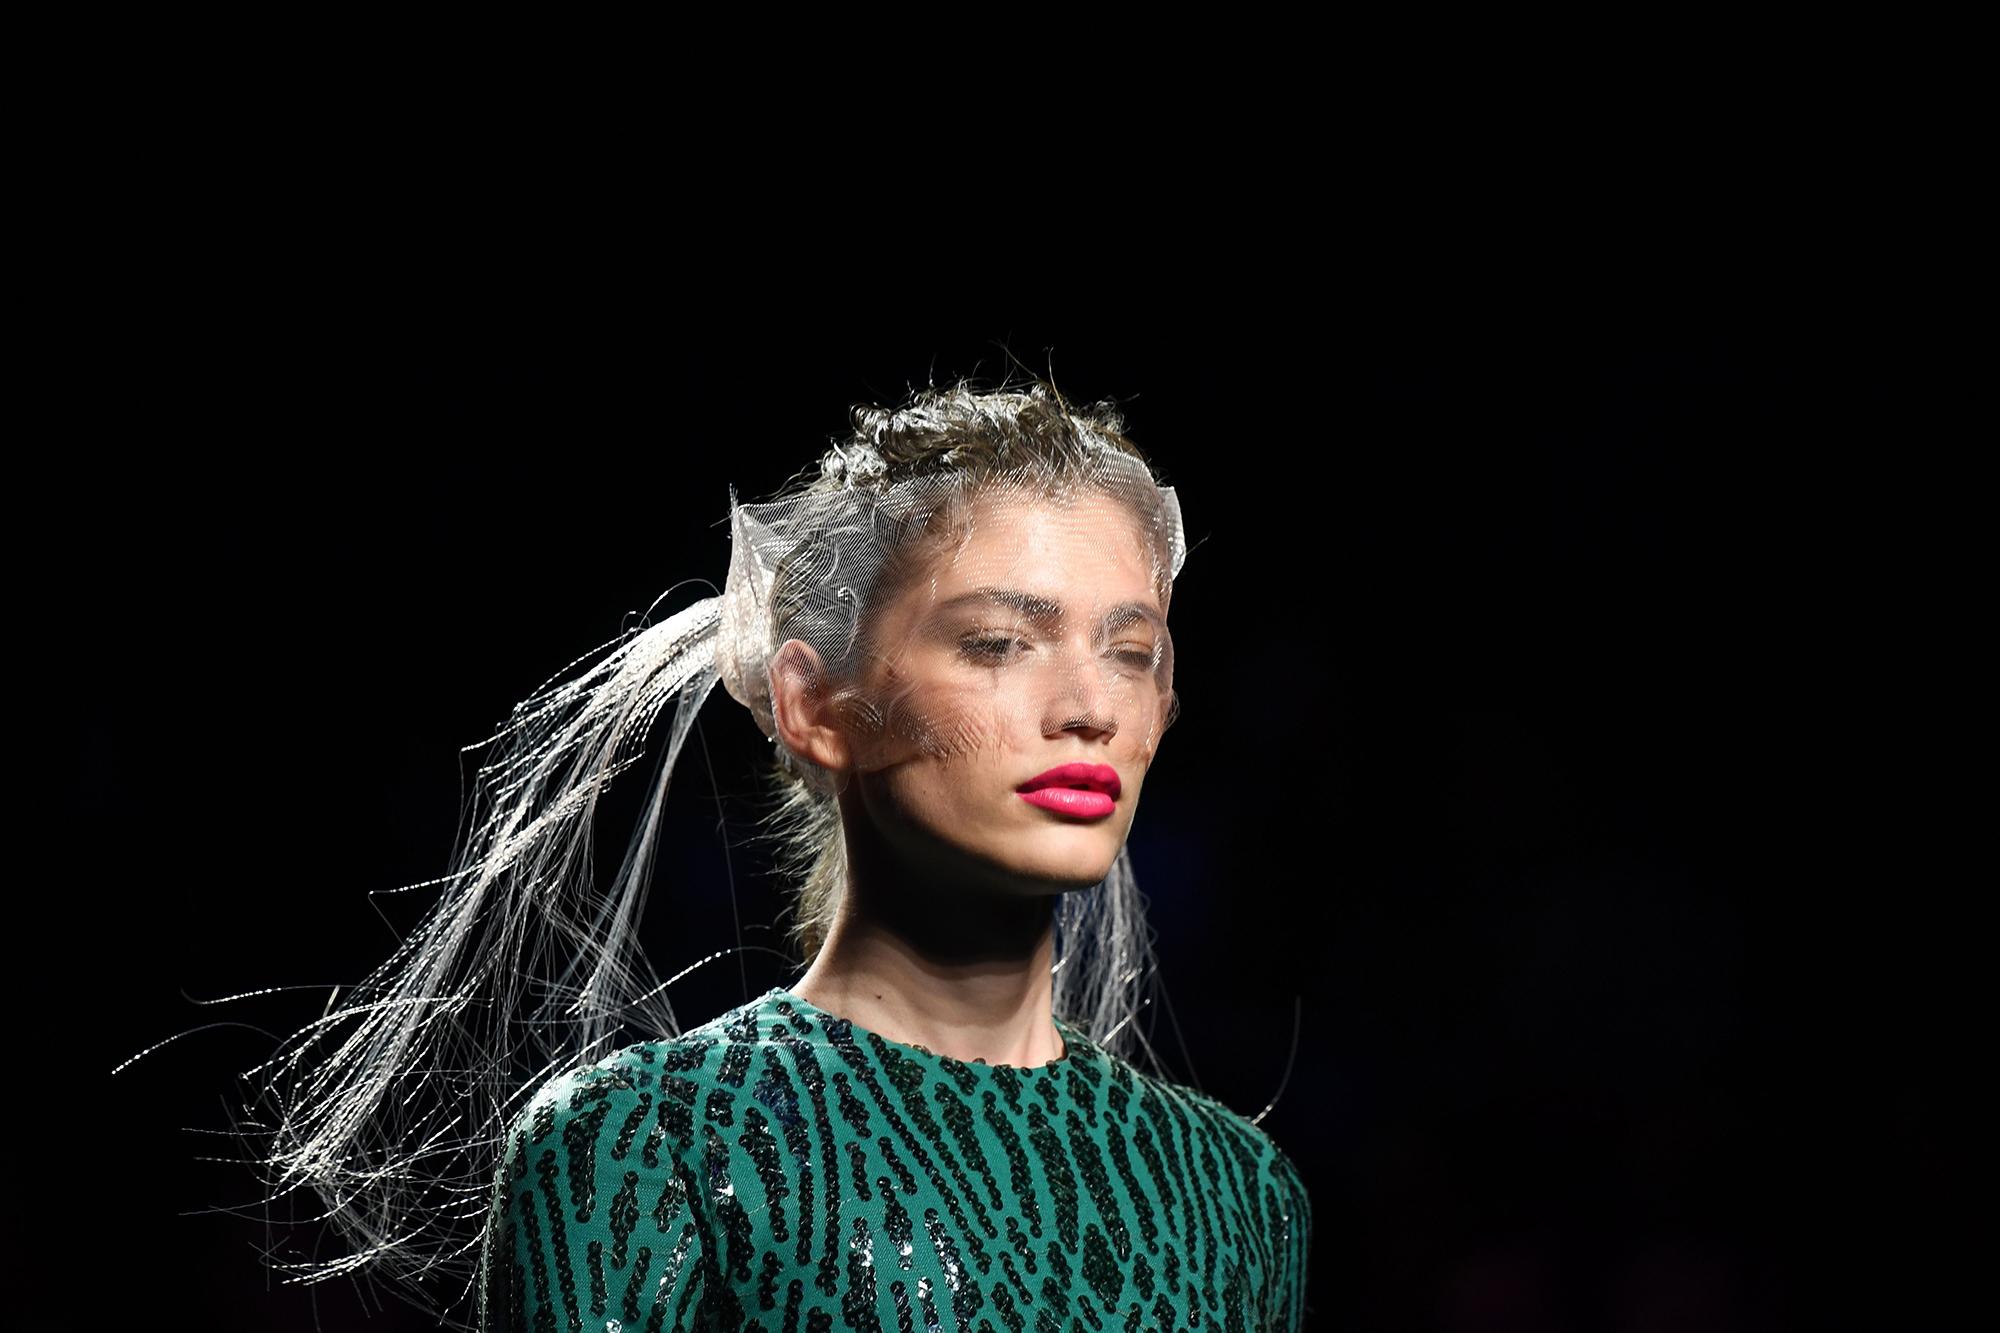 Victoria s secret models clipart jpg freeuse stock Victoria\'s Secret Hires Transgender Model Valentina Sampaio ... jpg freeuse stock